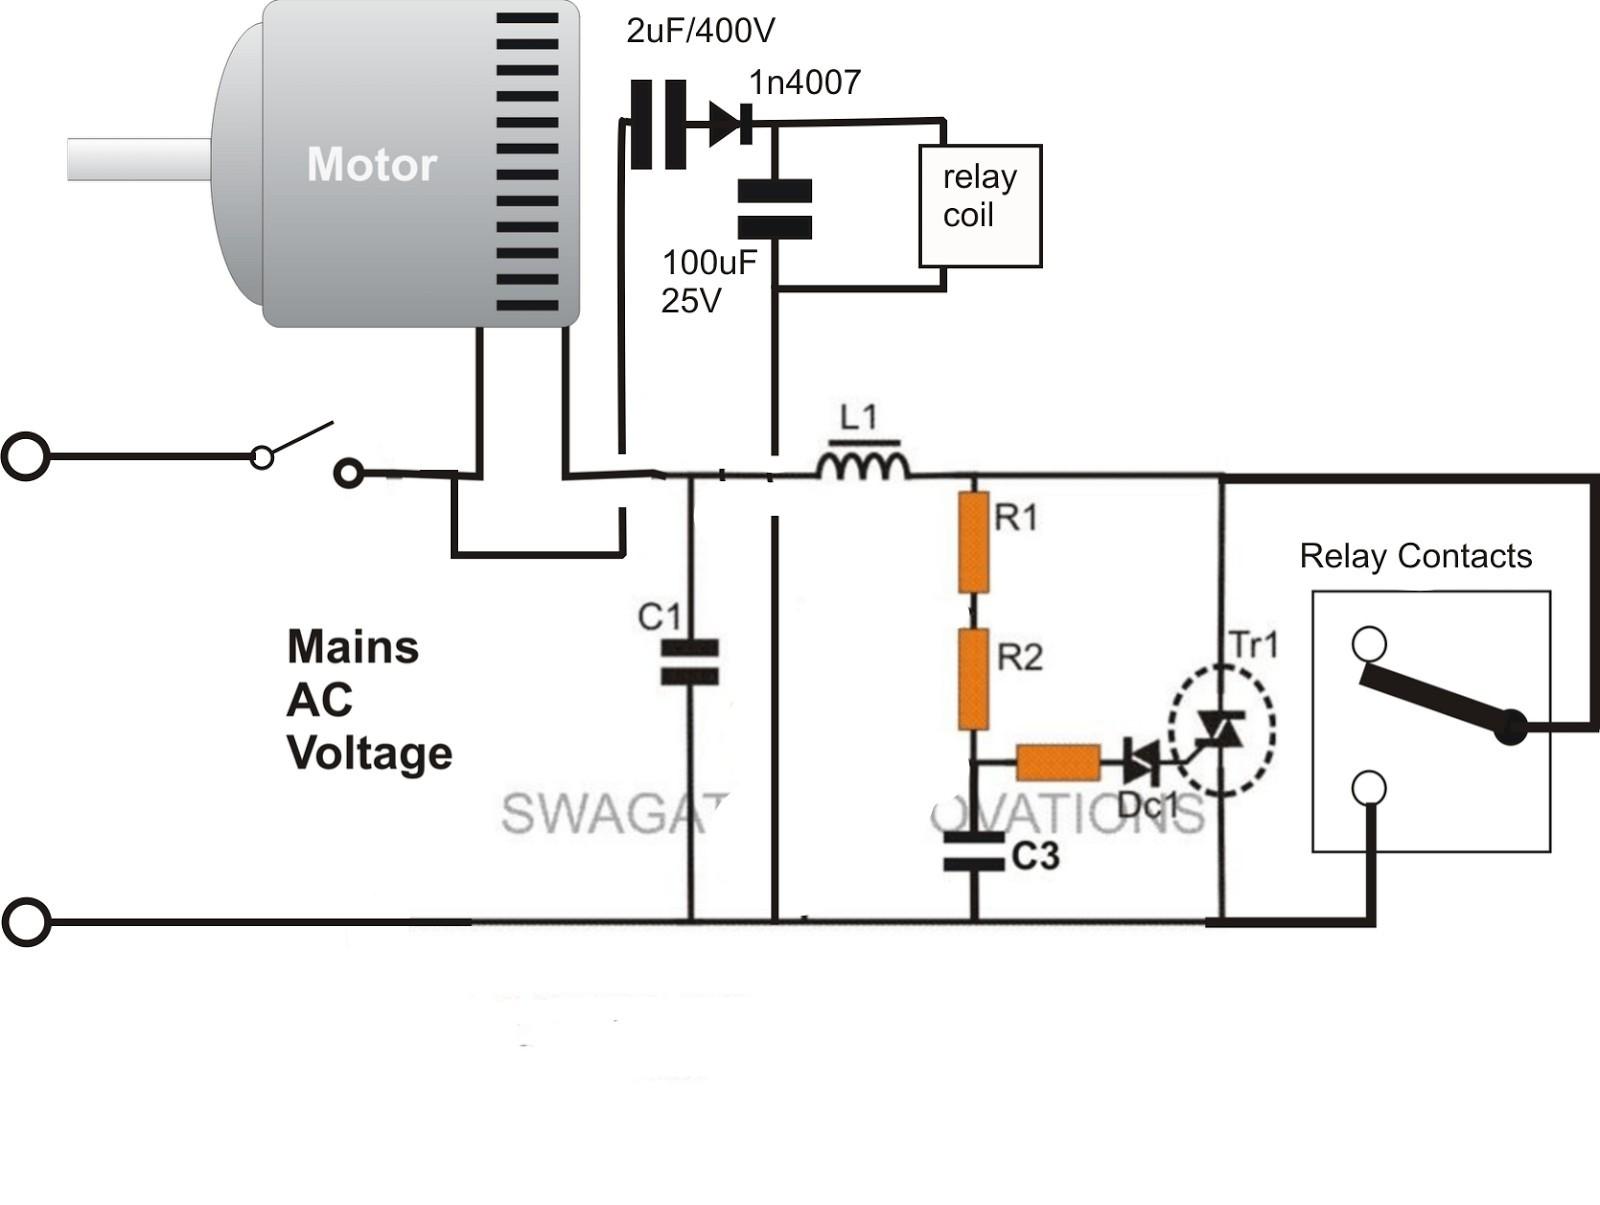 Surprising Motor Run Capacitor Wiring Diagram Wirings Diagram Wiring Digital Resources Lavecompassionincorg